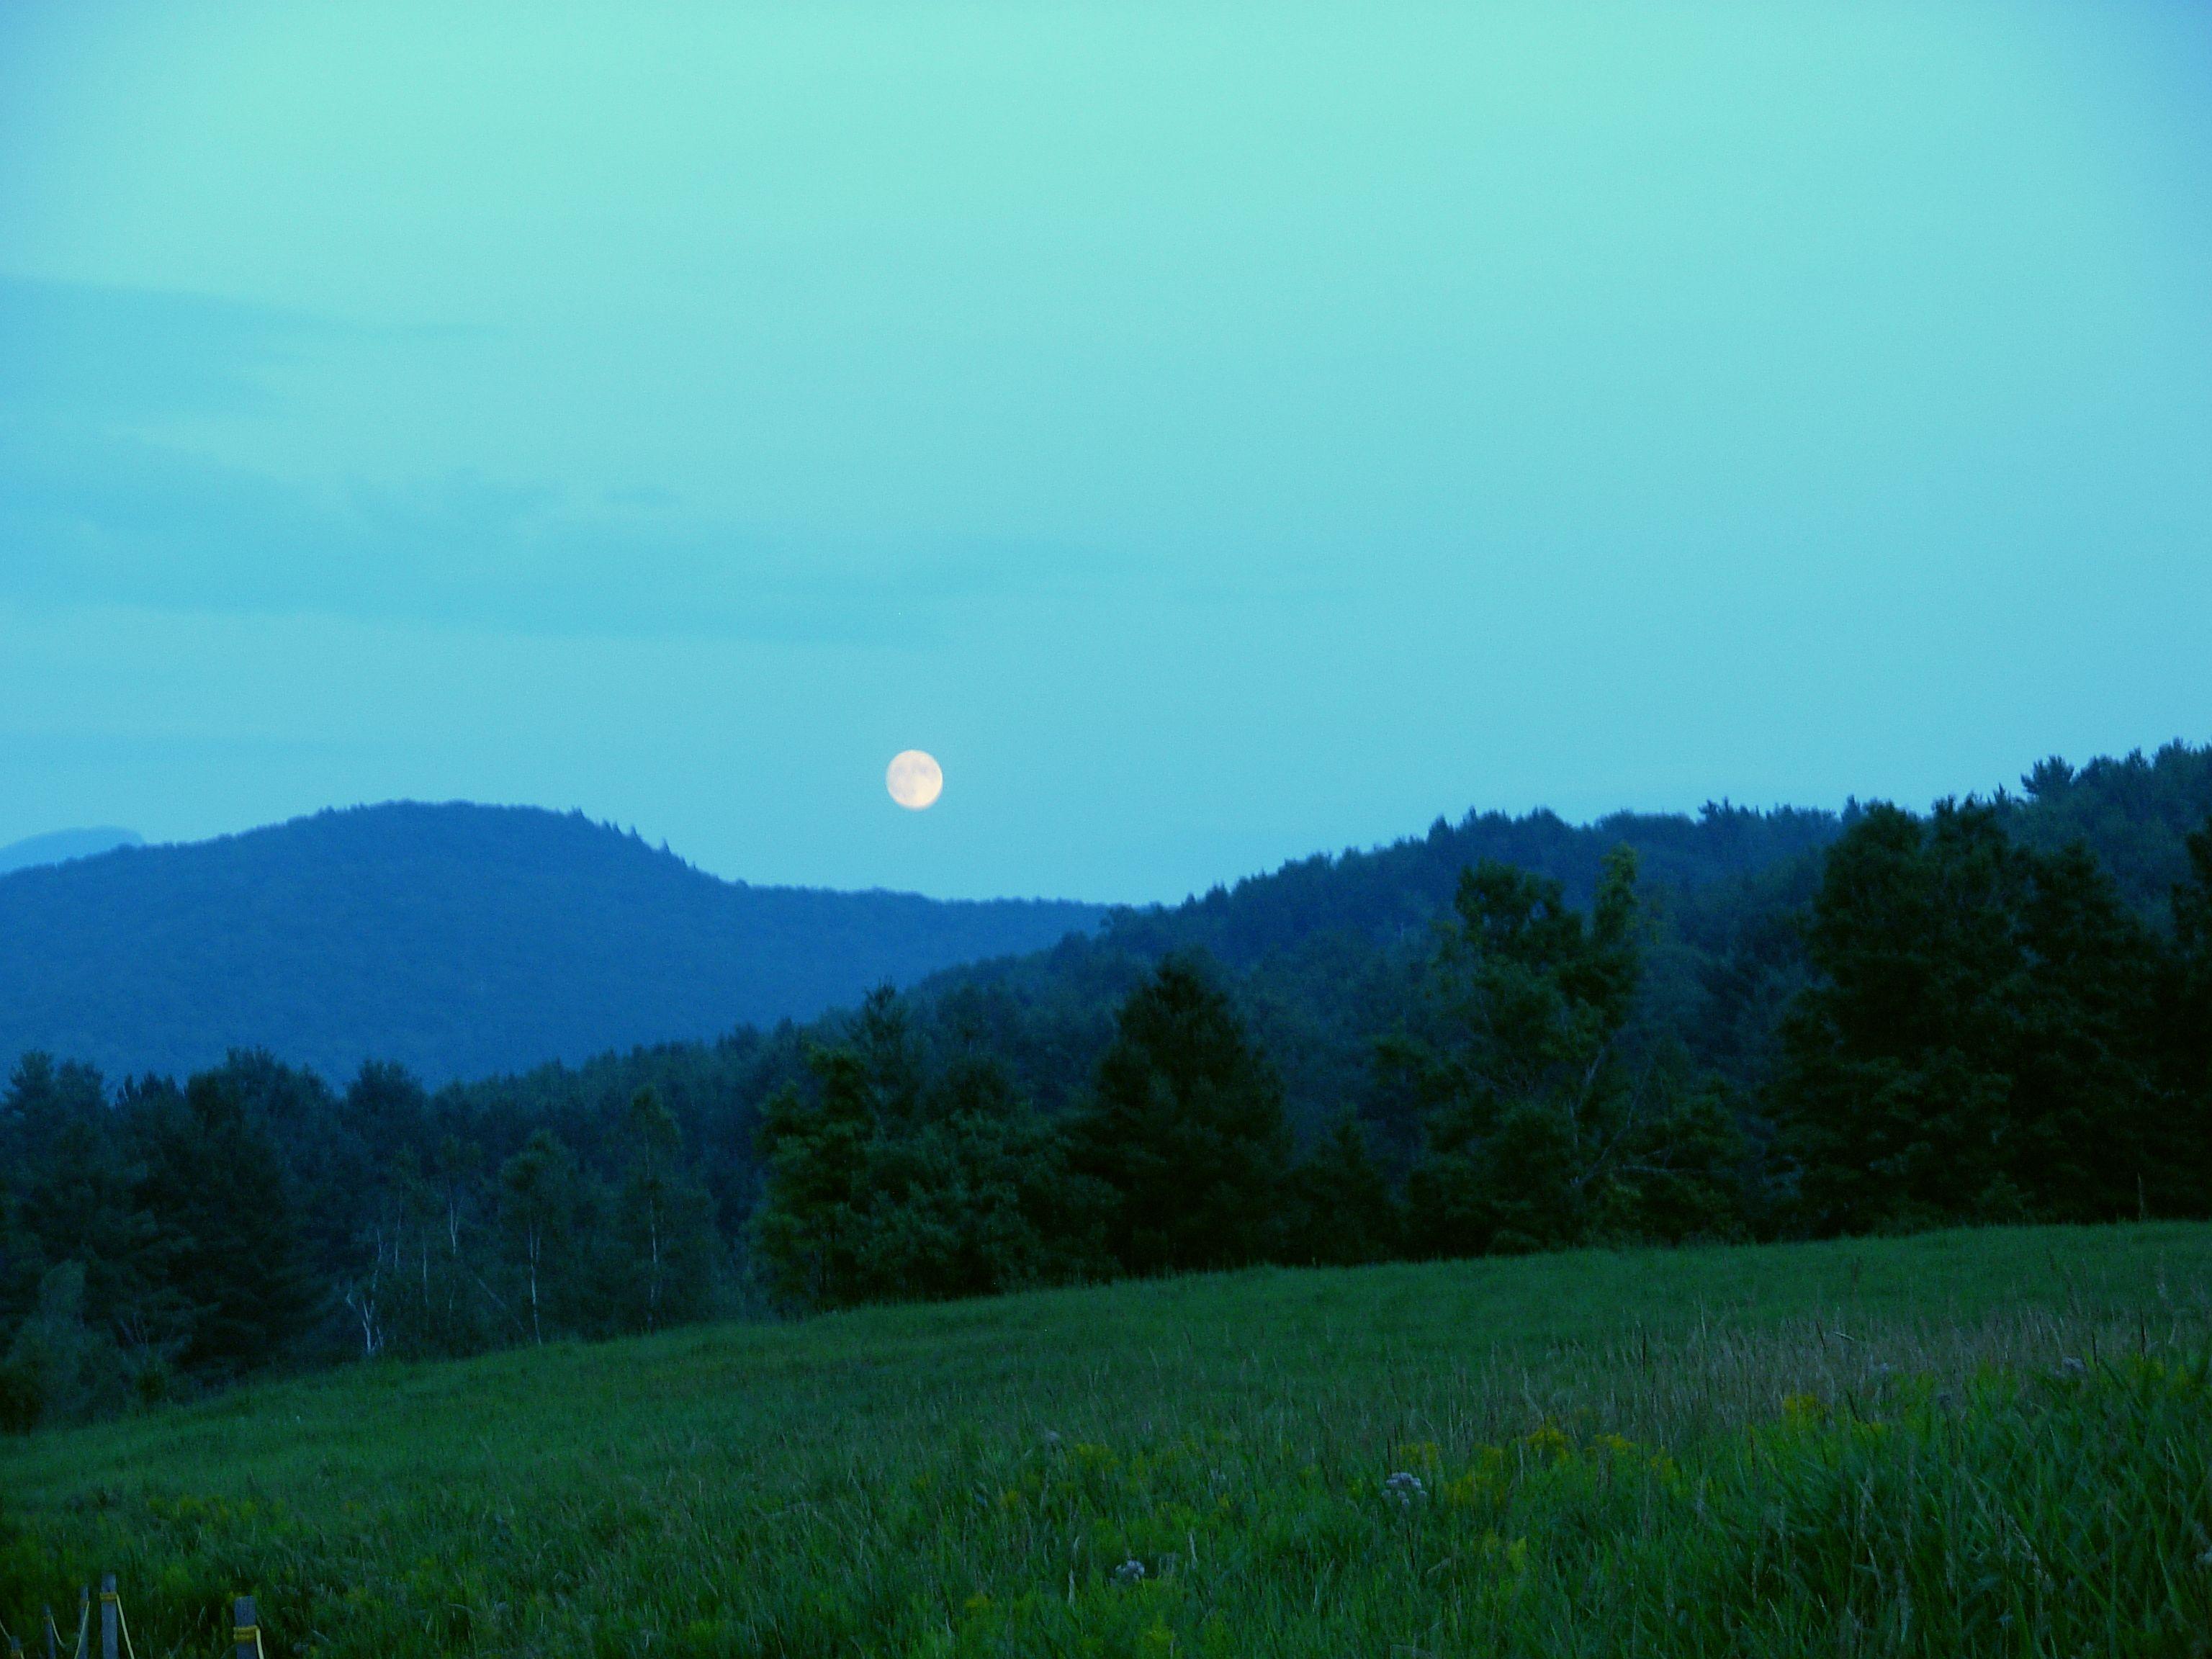 8/4/09 - Moon over Owl's Head